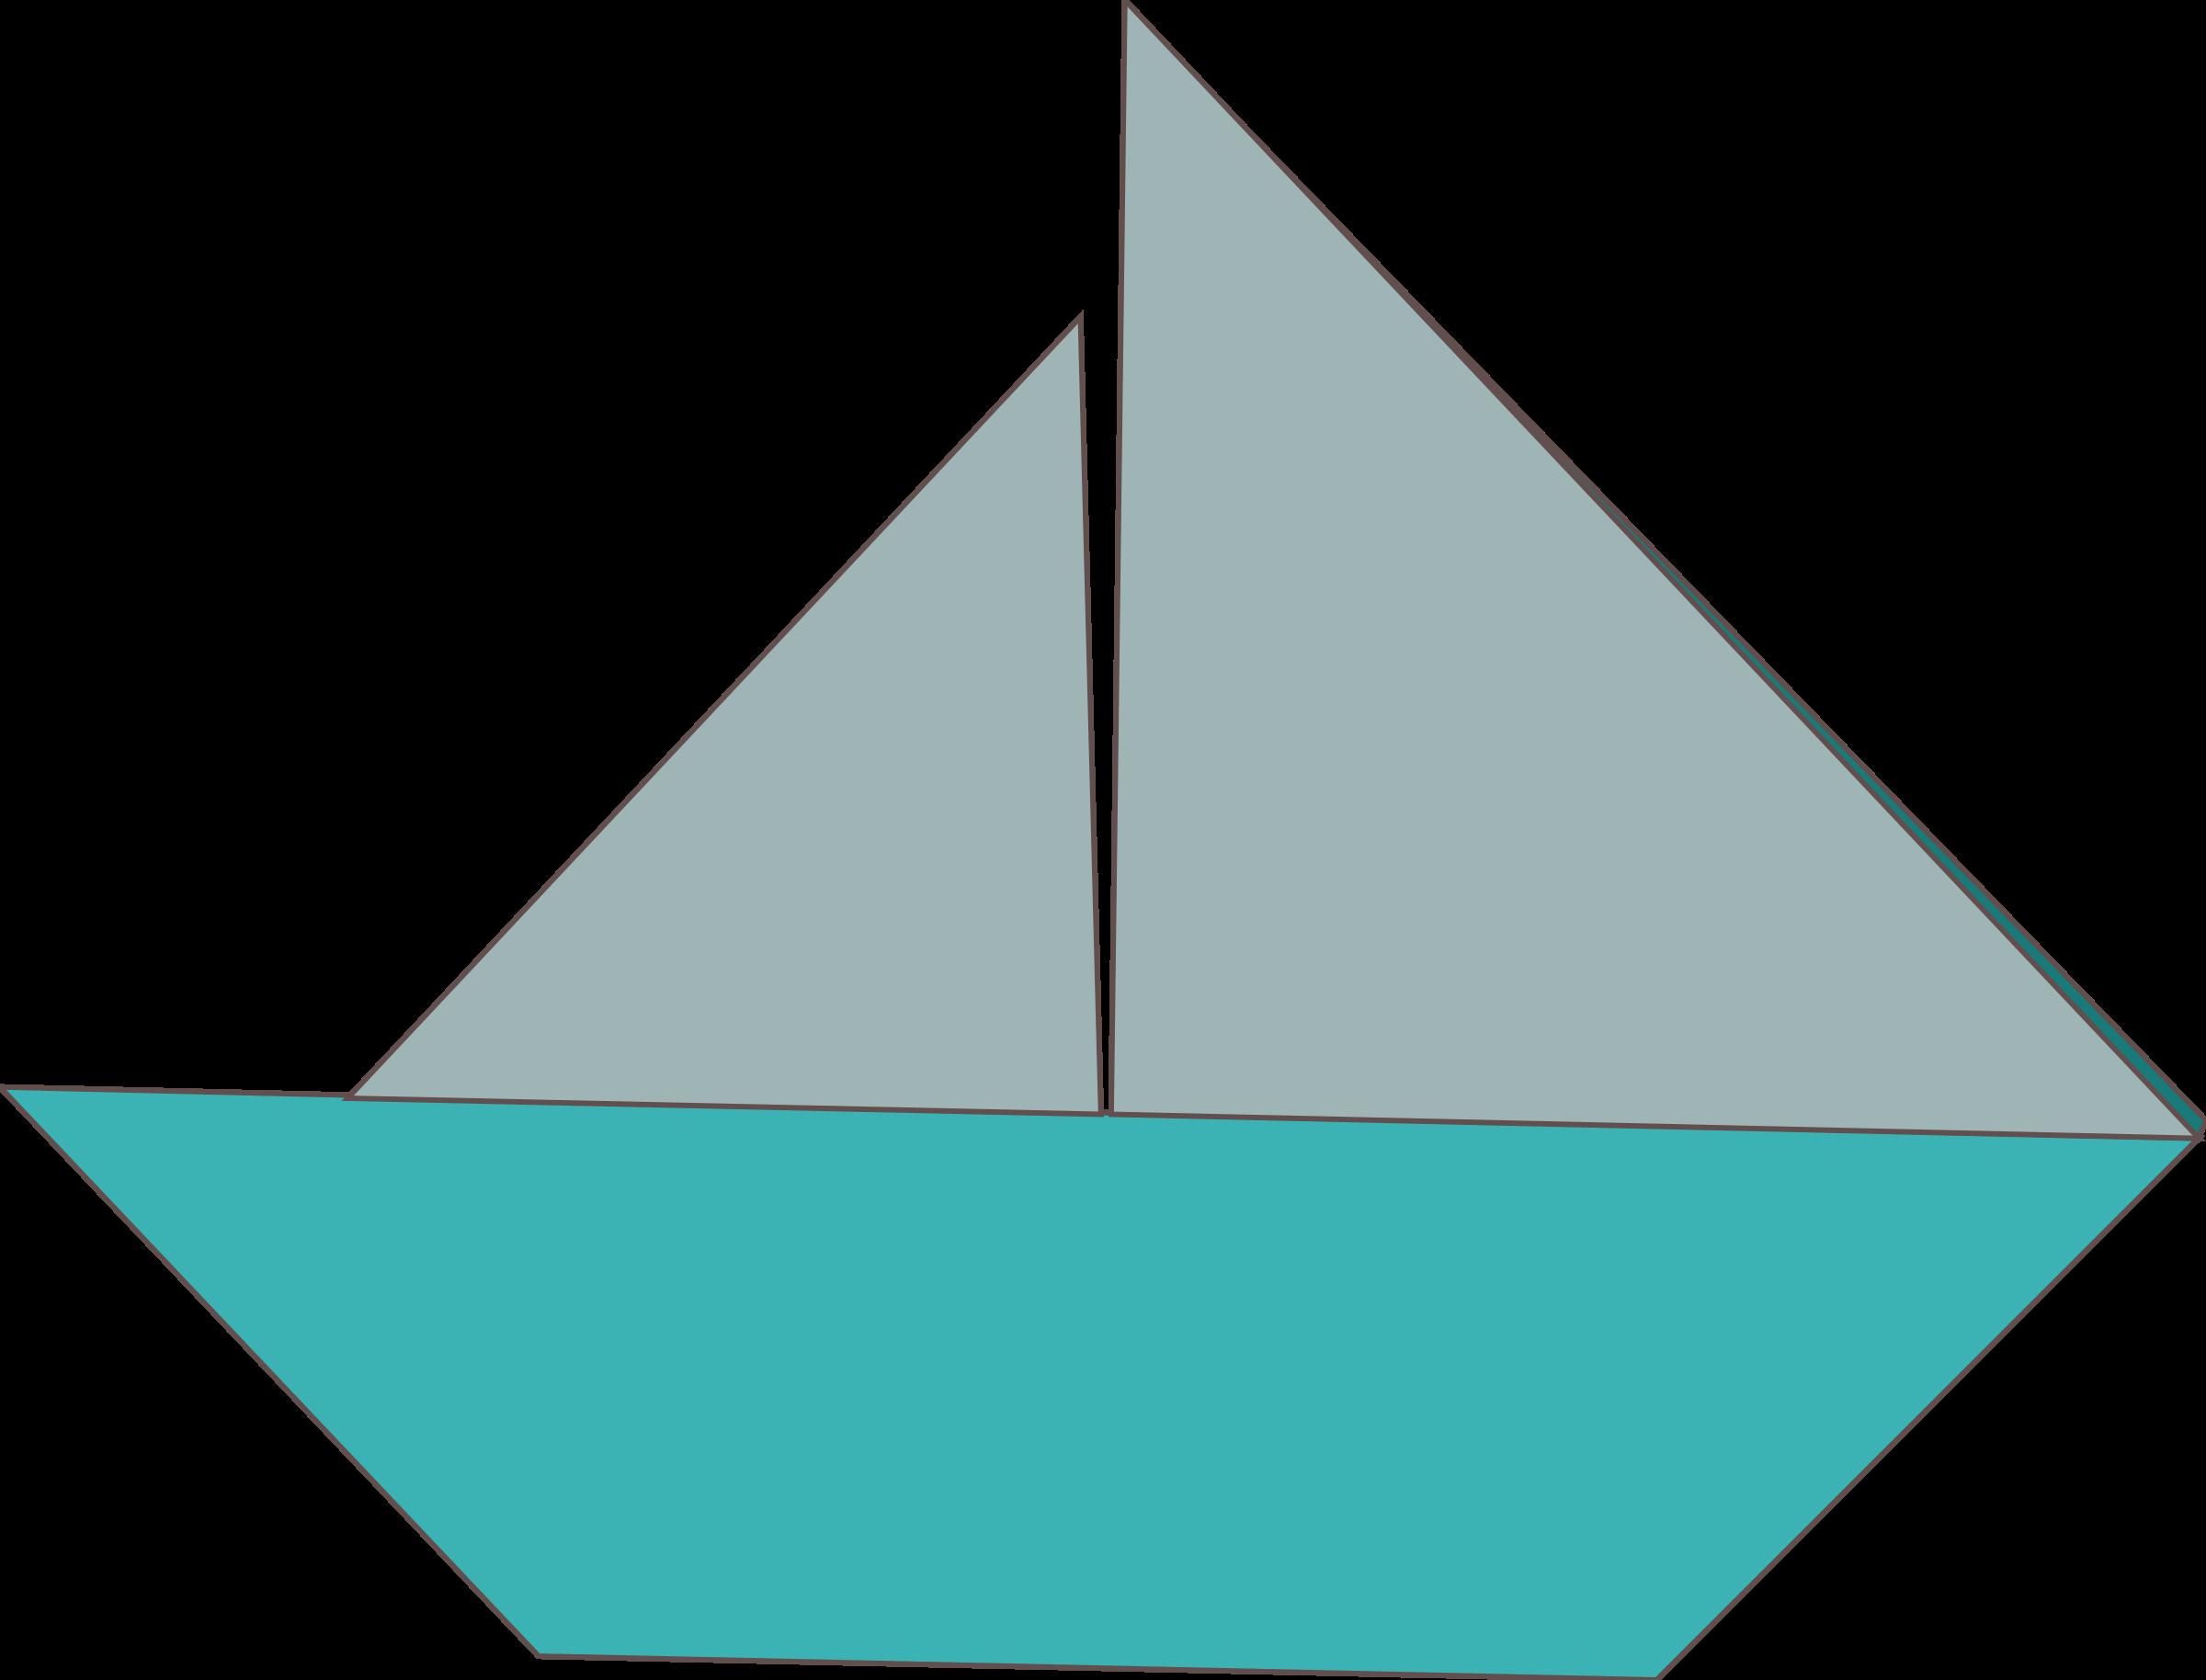 Origami big image png. Paper clipart sailboat